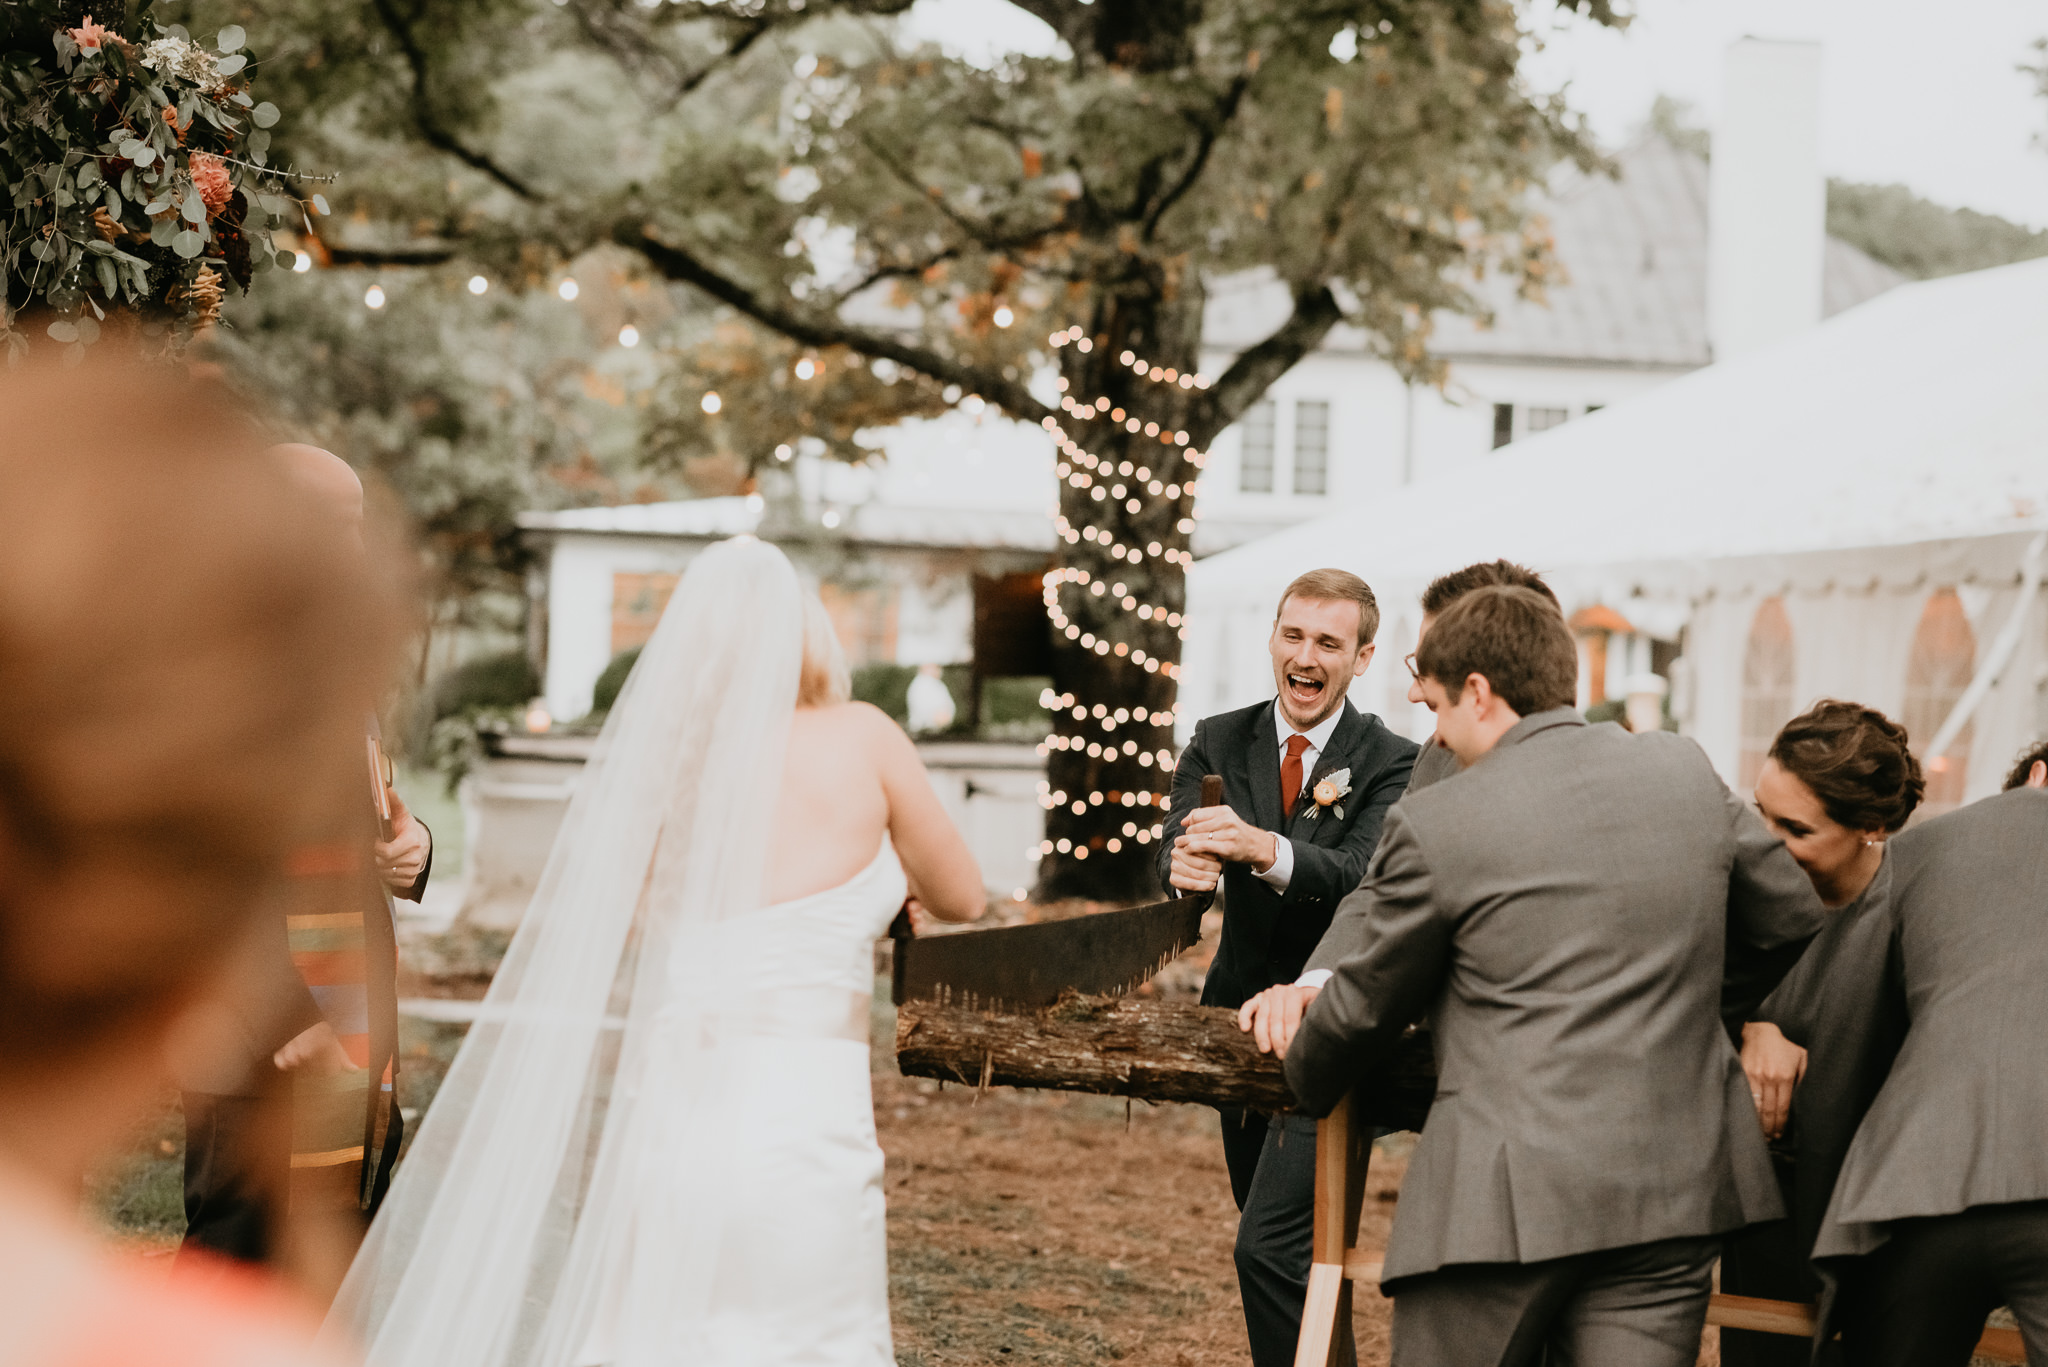 Sundara - Weddings - Virginia - Best Wedding Photographer - Pat Cori Photography-50.jpg